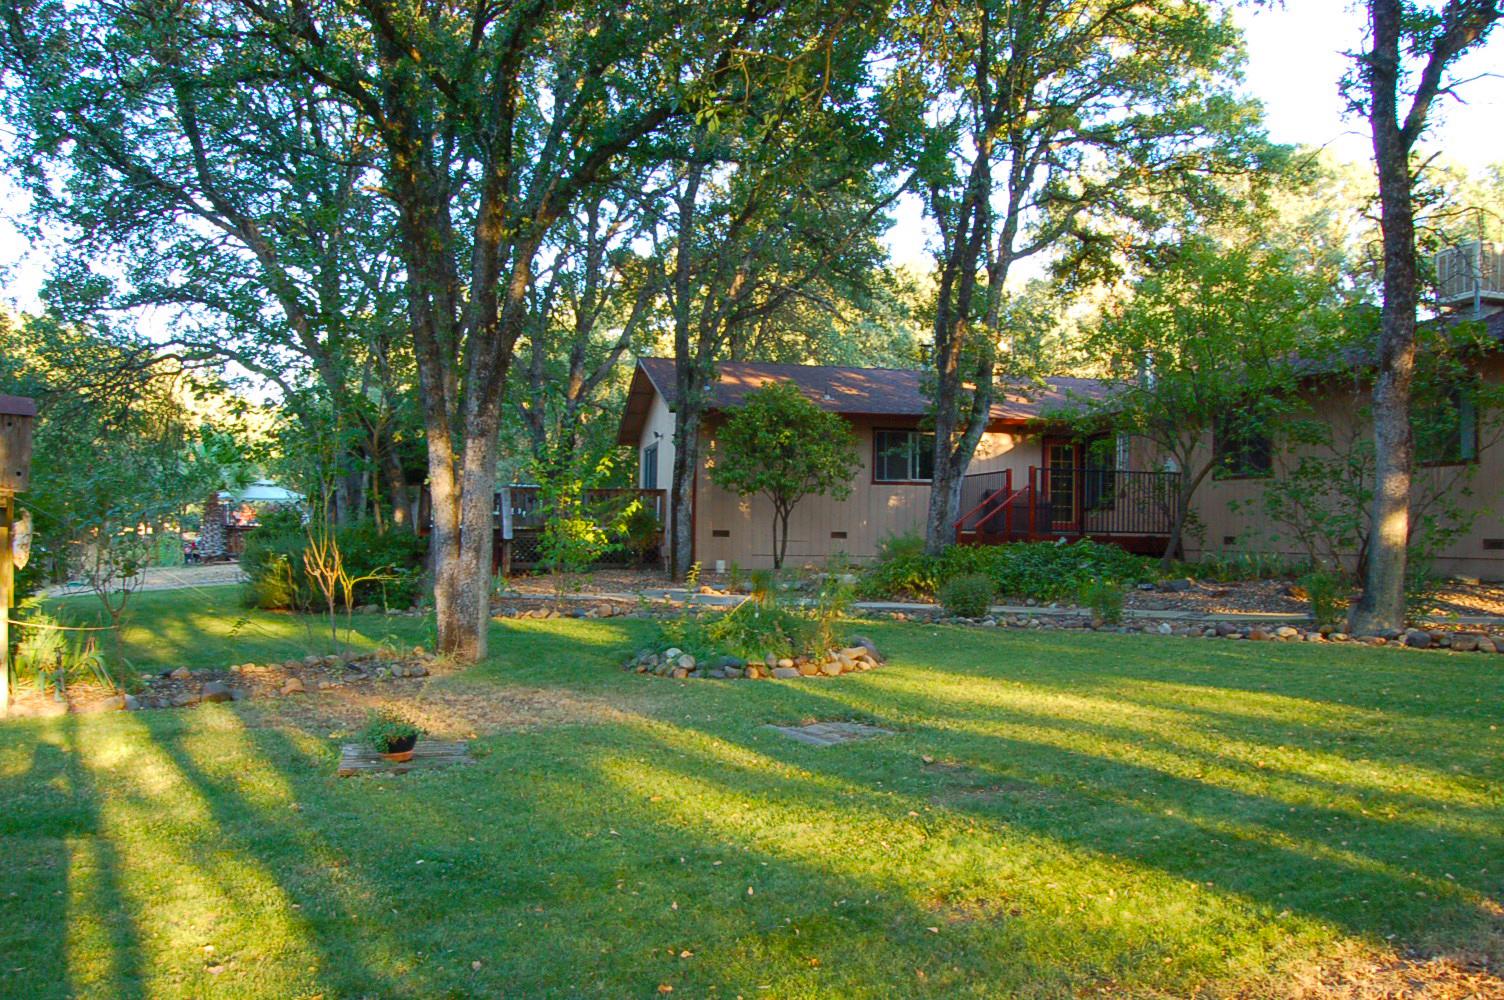 17410-Hooker-Creek-Rd-Cottonwood-CA-yard